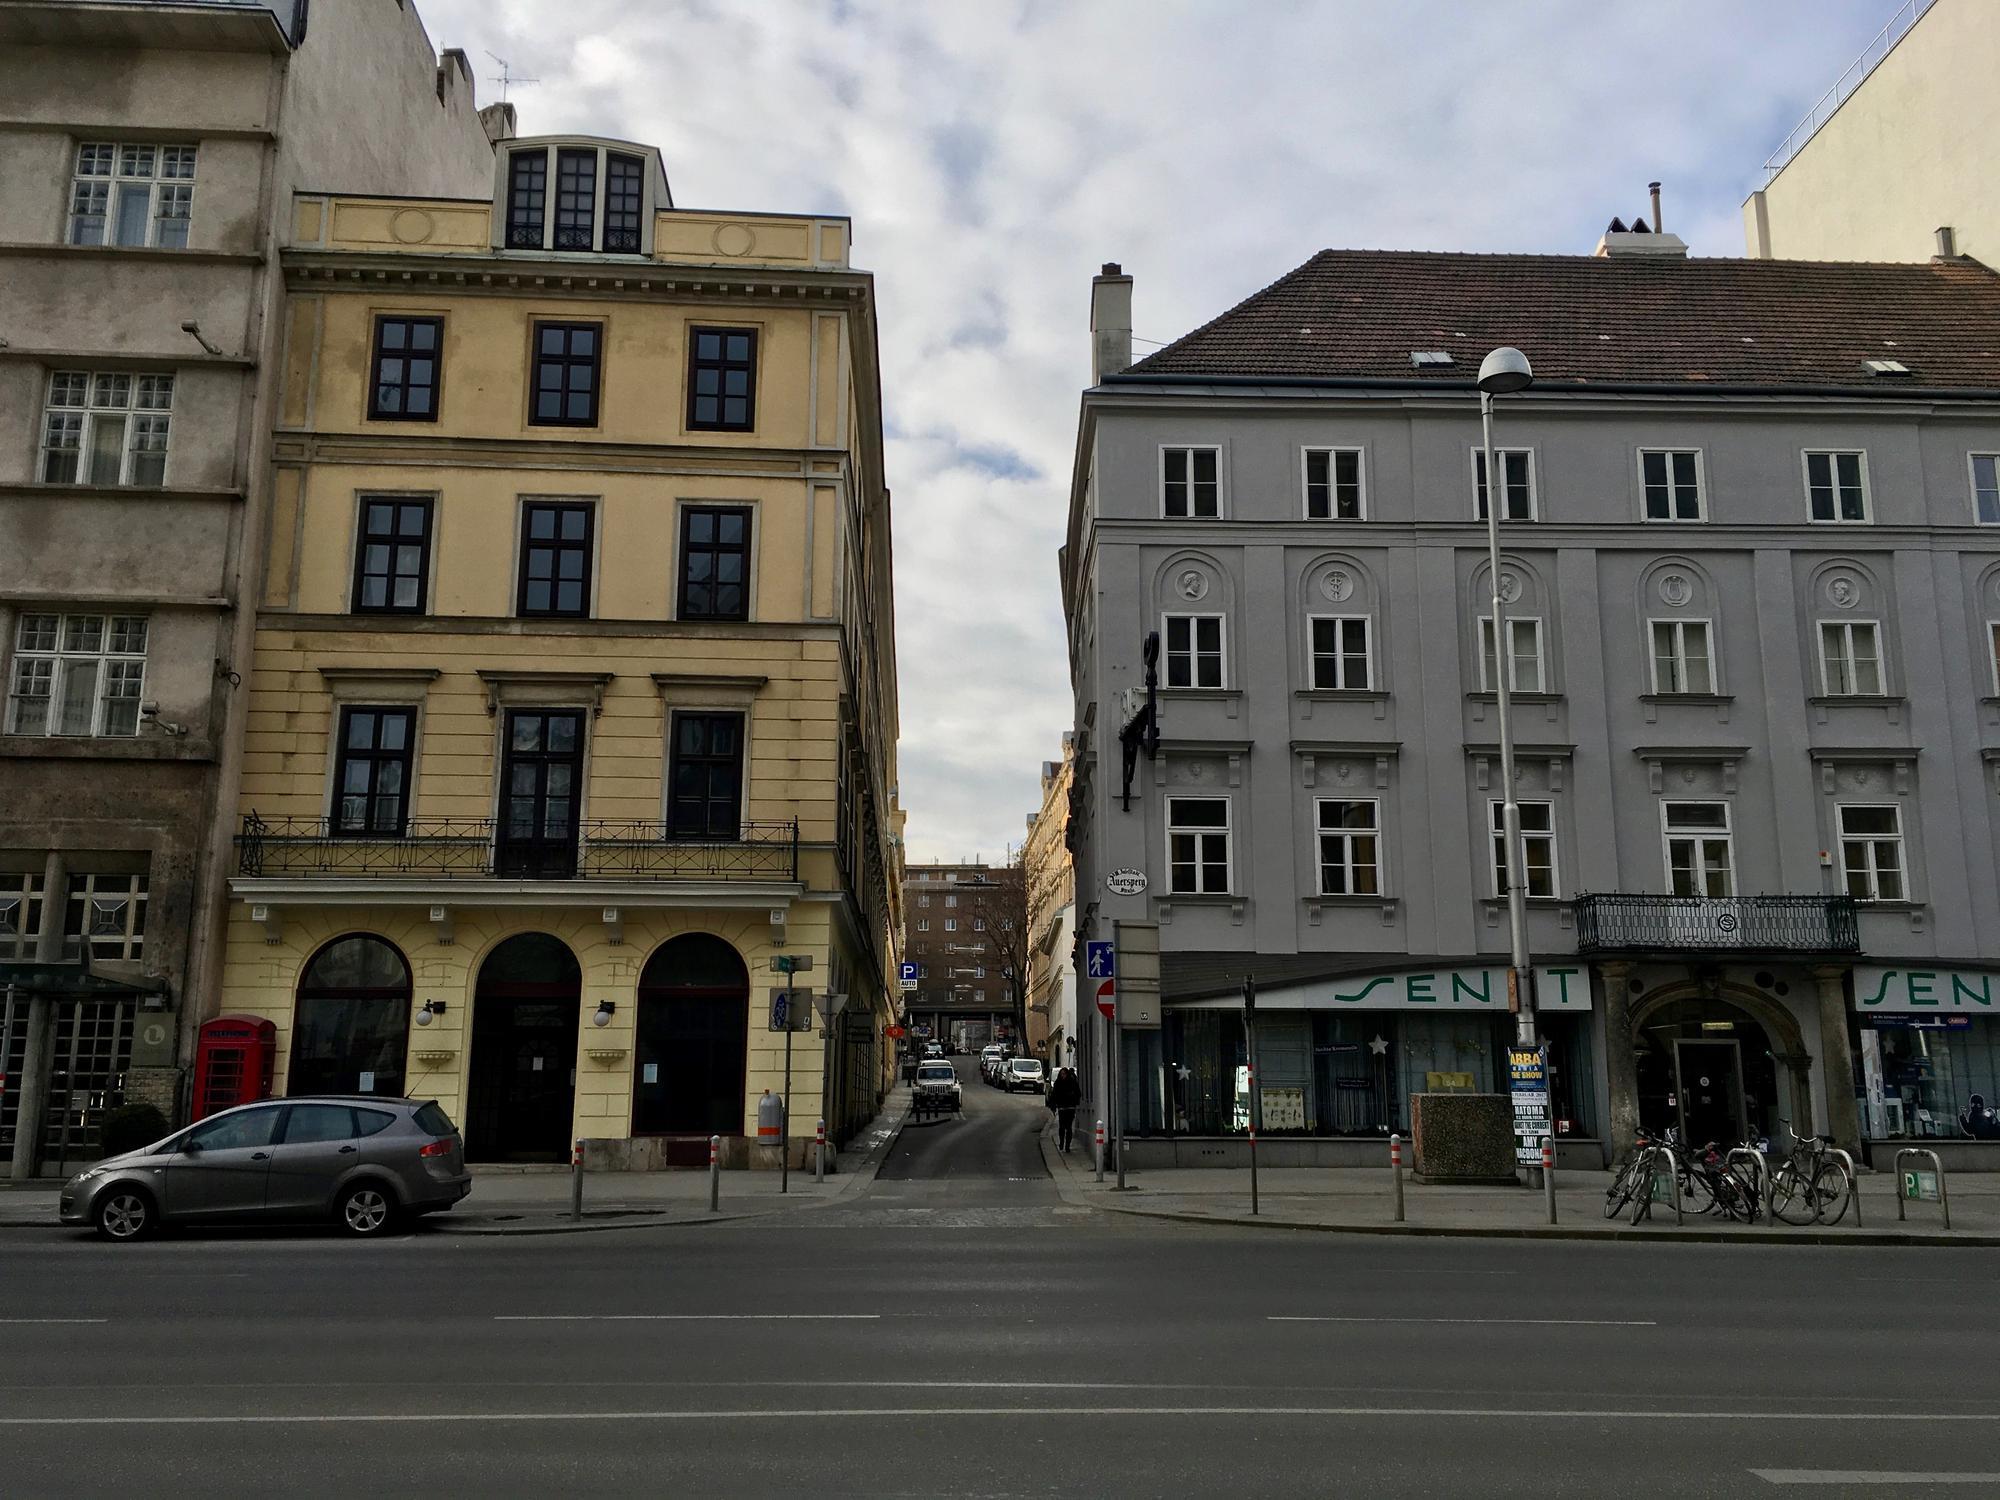 🇦🇹 Вена, Австрия, январь 2017.